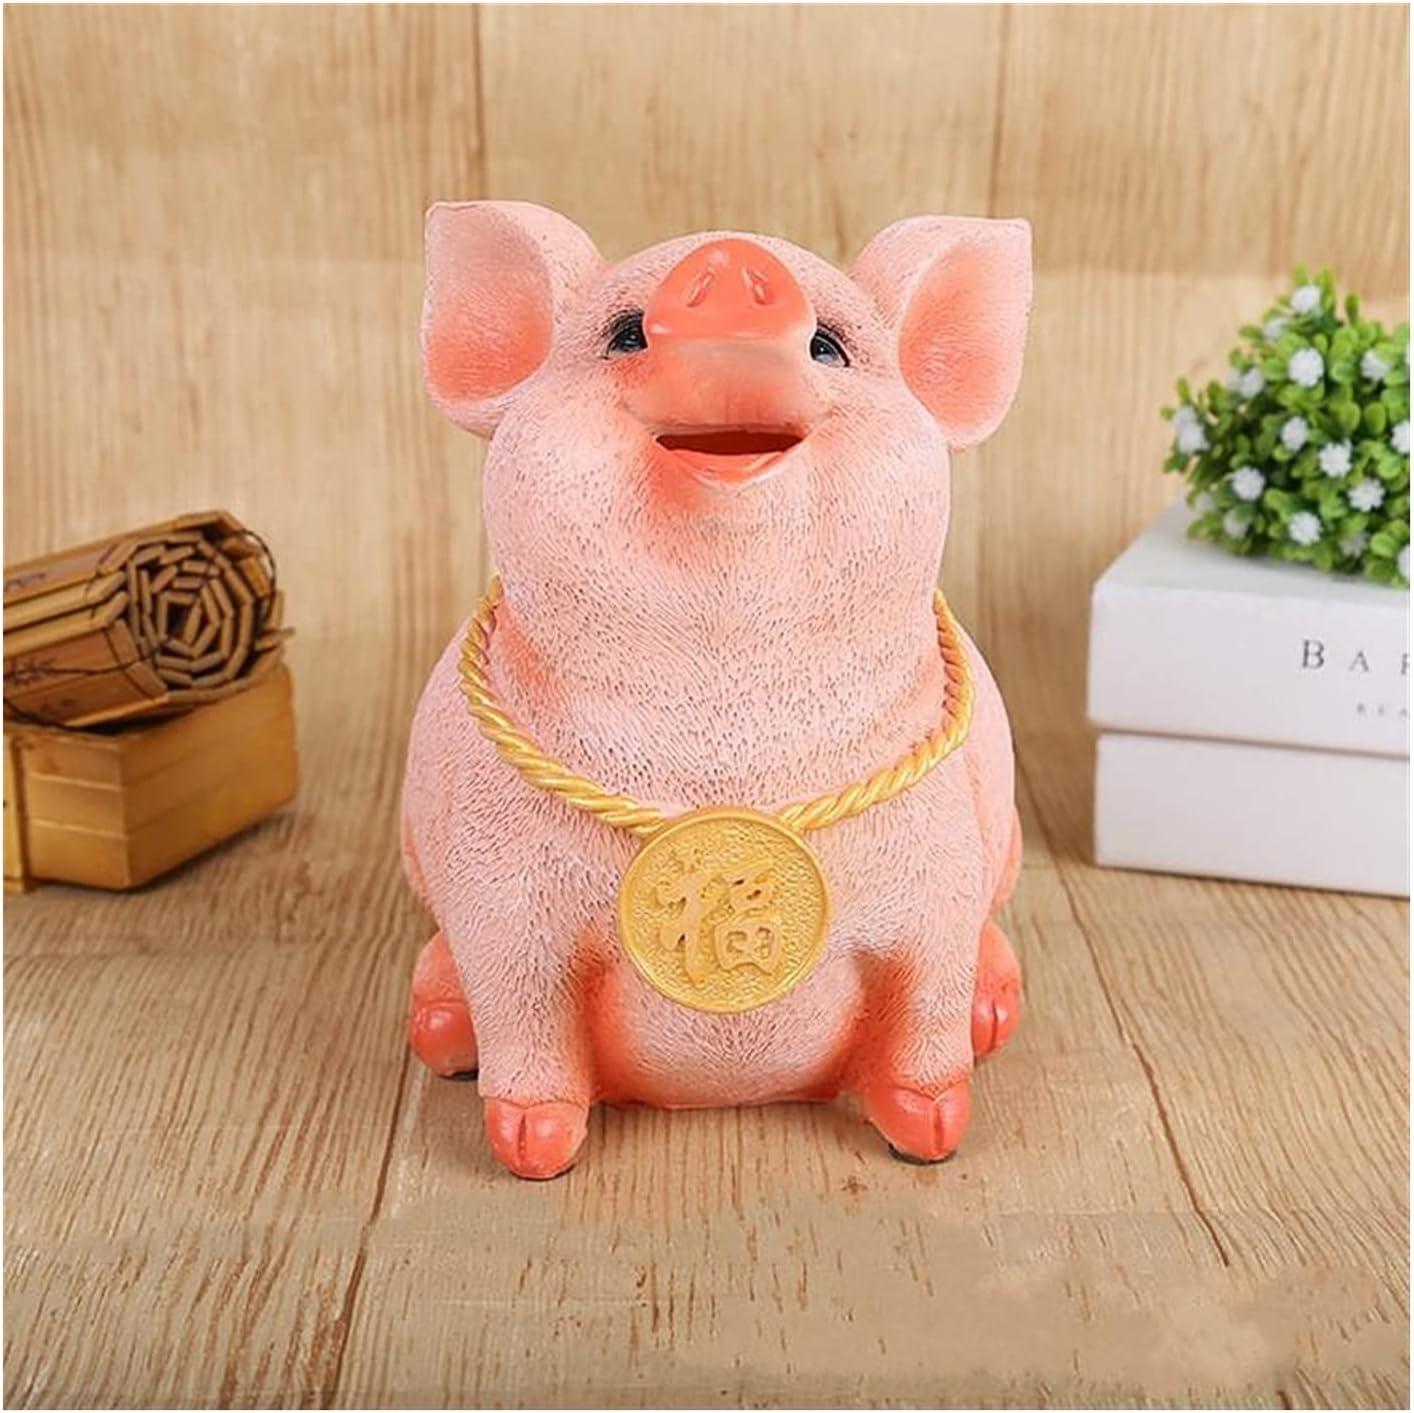 ZQDMBH Piggy Bank San Diego Mall El Paso Mall Resin Crafts Pig Banks